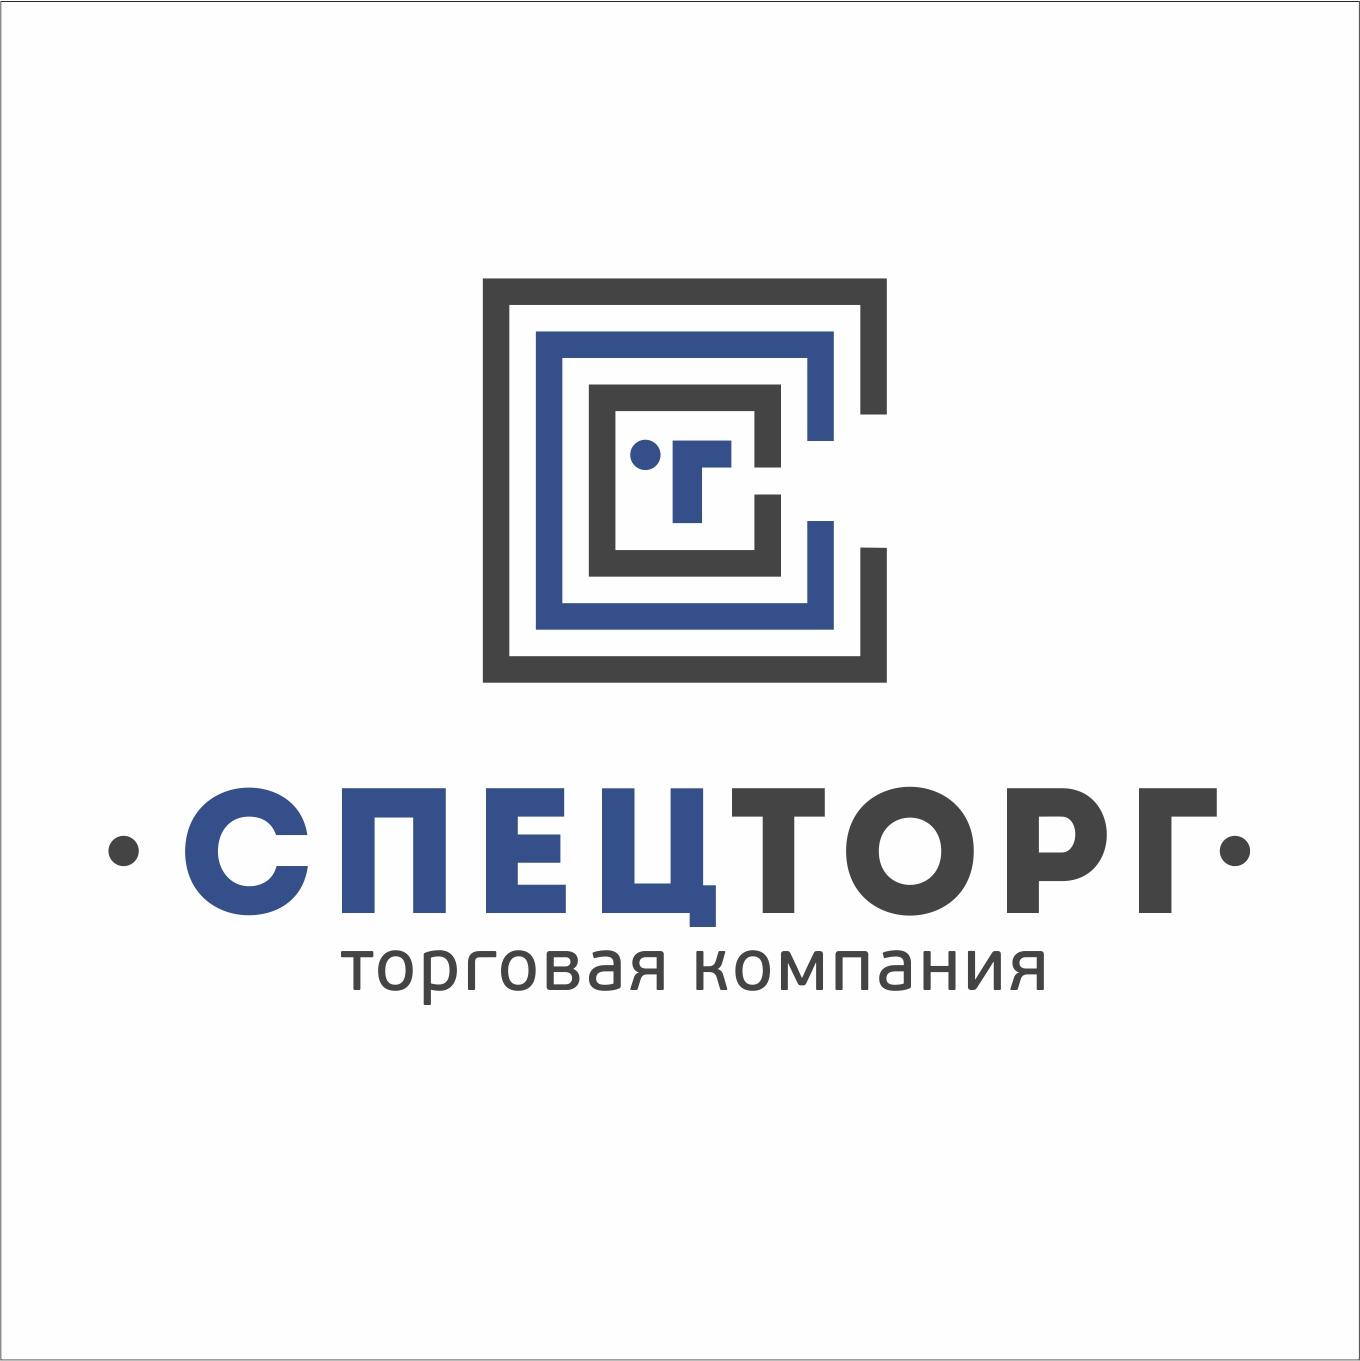 Разработать дизайн  логотипа компании фото f_0945dc87bd2a40cd.jpg